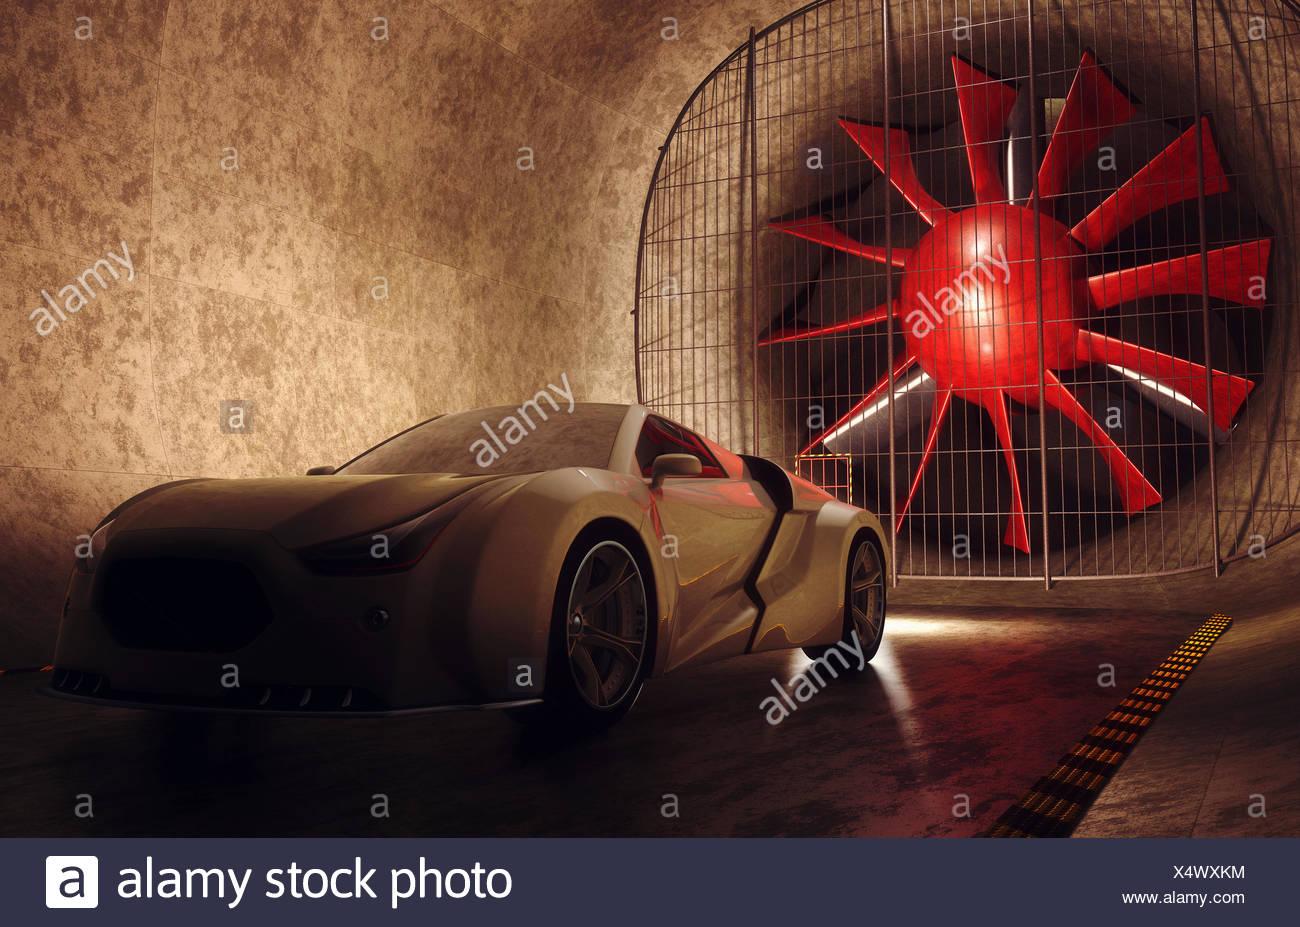 Sportwagen im Windkanal, Abbildung. Stockbild